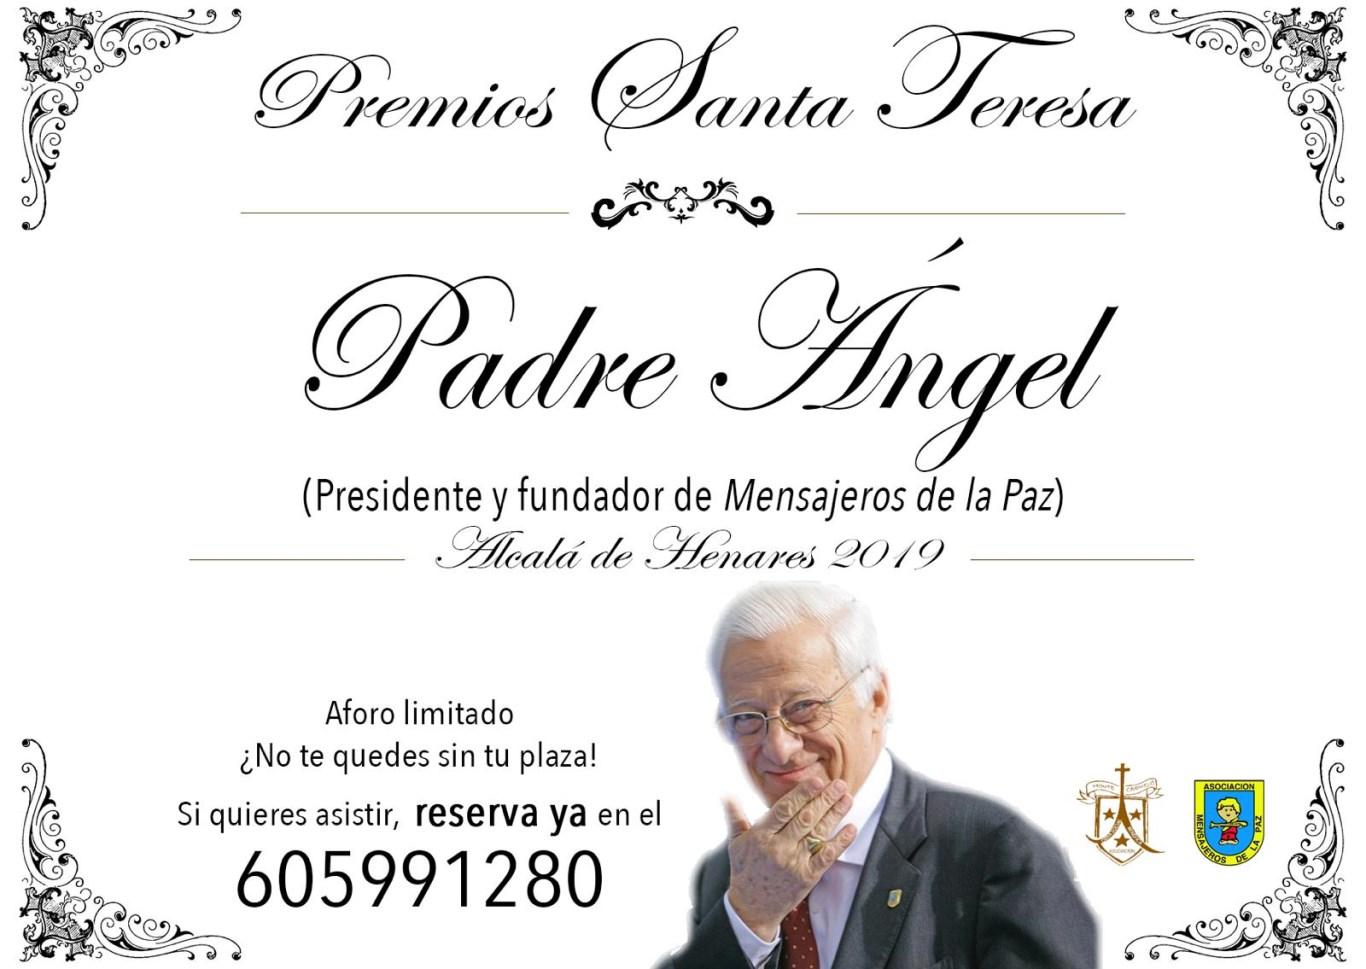 Premios Santa Teresa